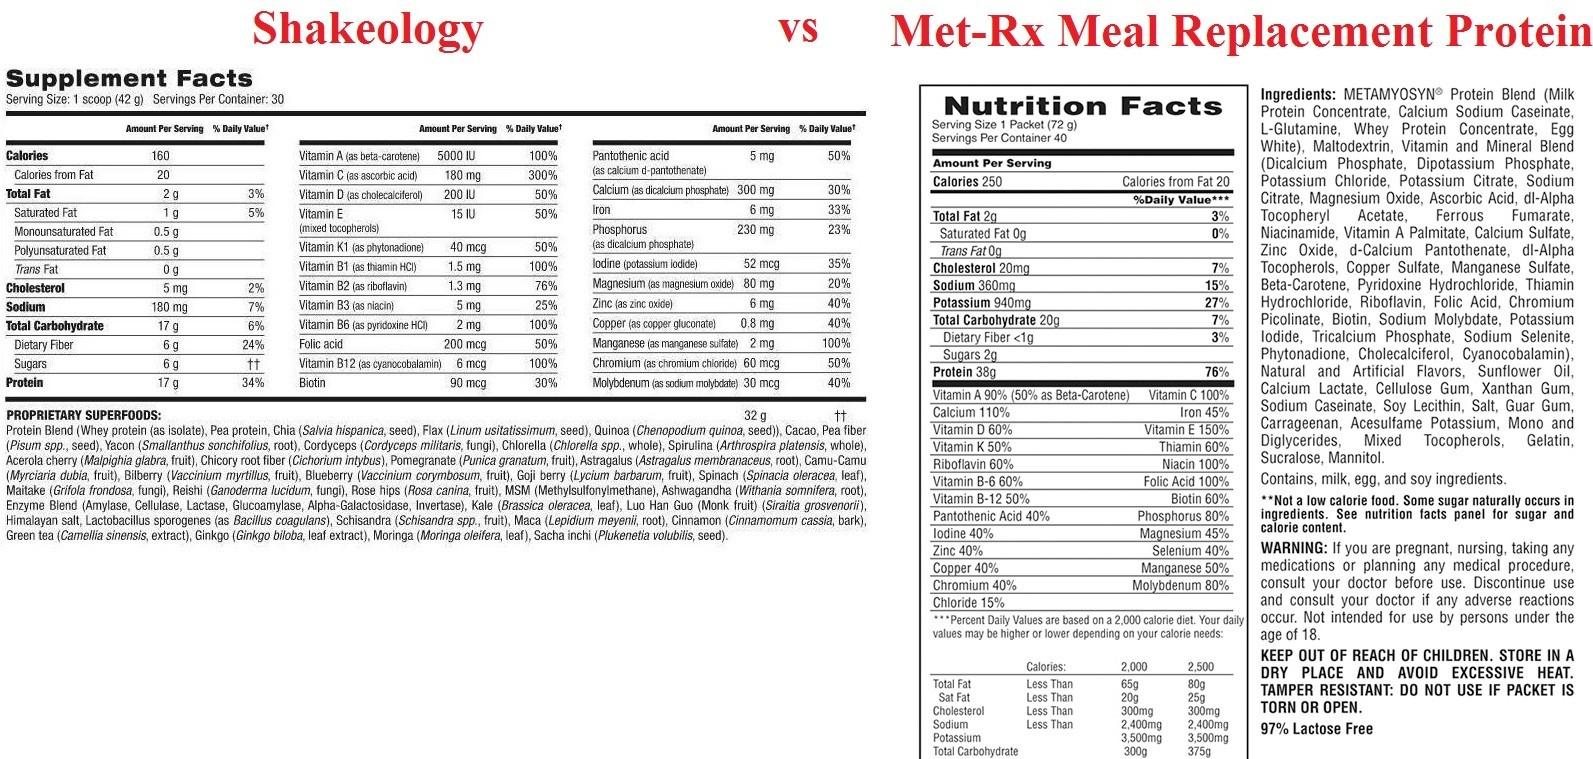 shakeology vs metrx